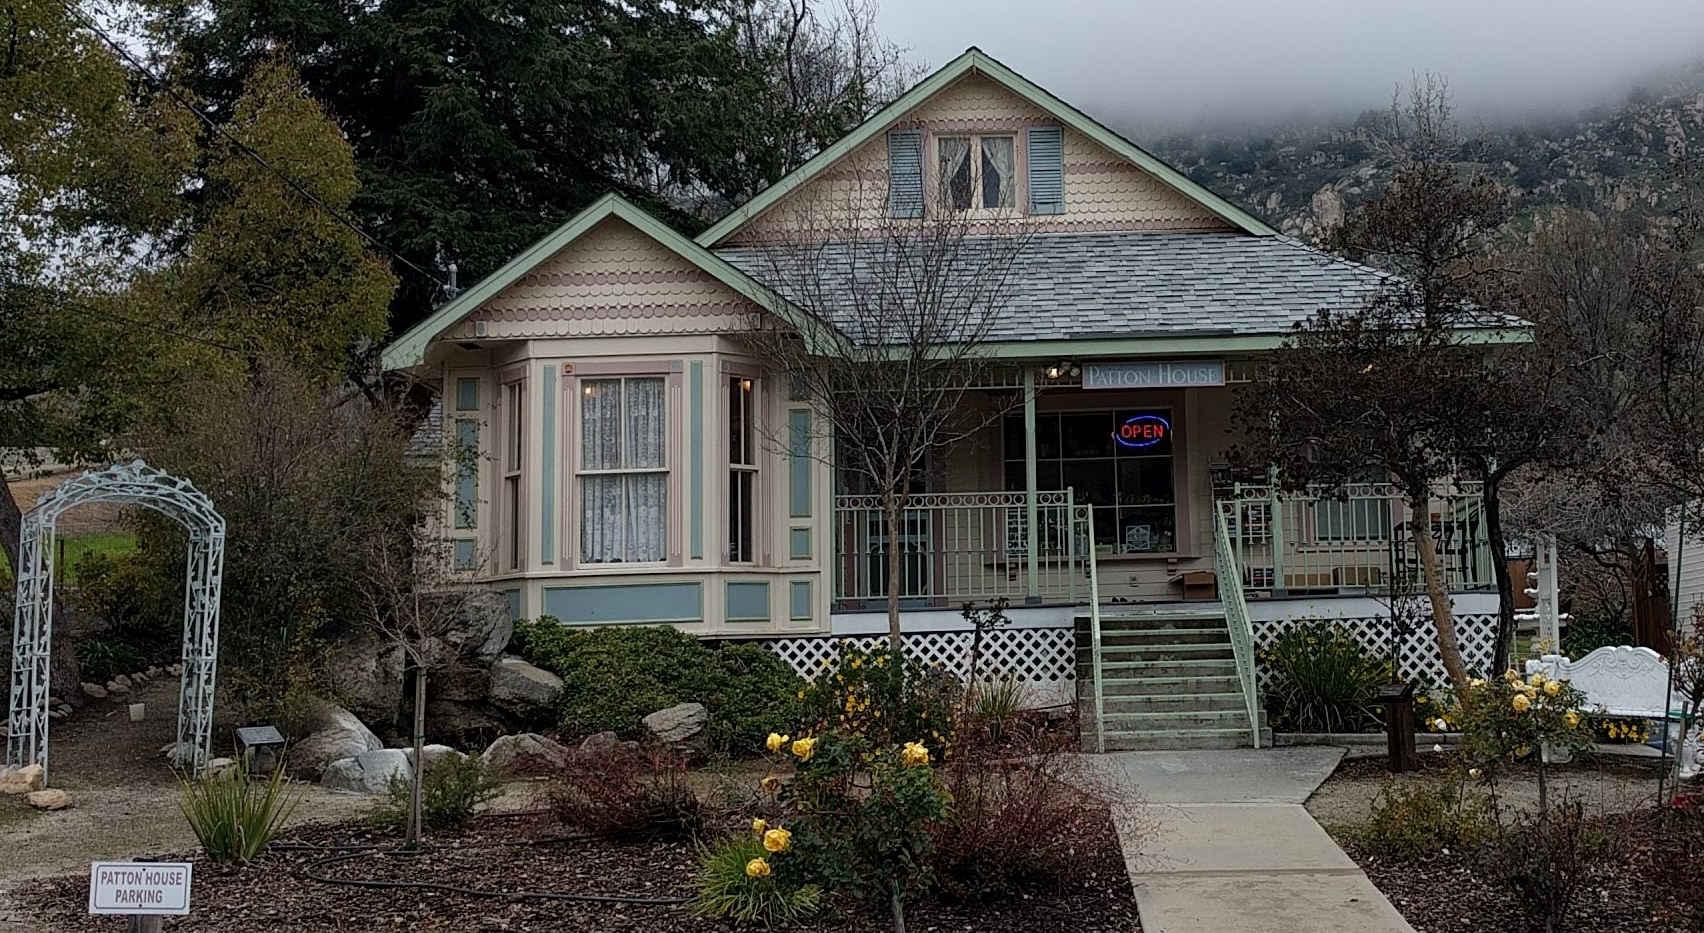 Patton House in Springville